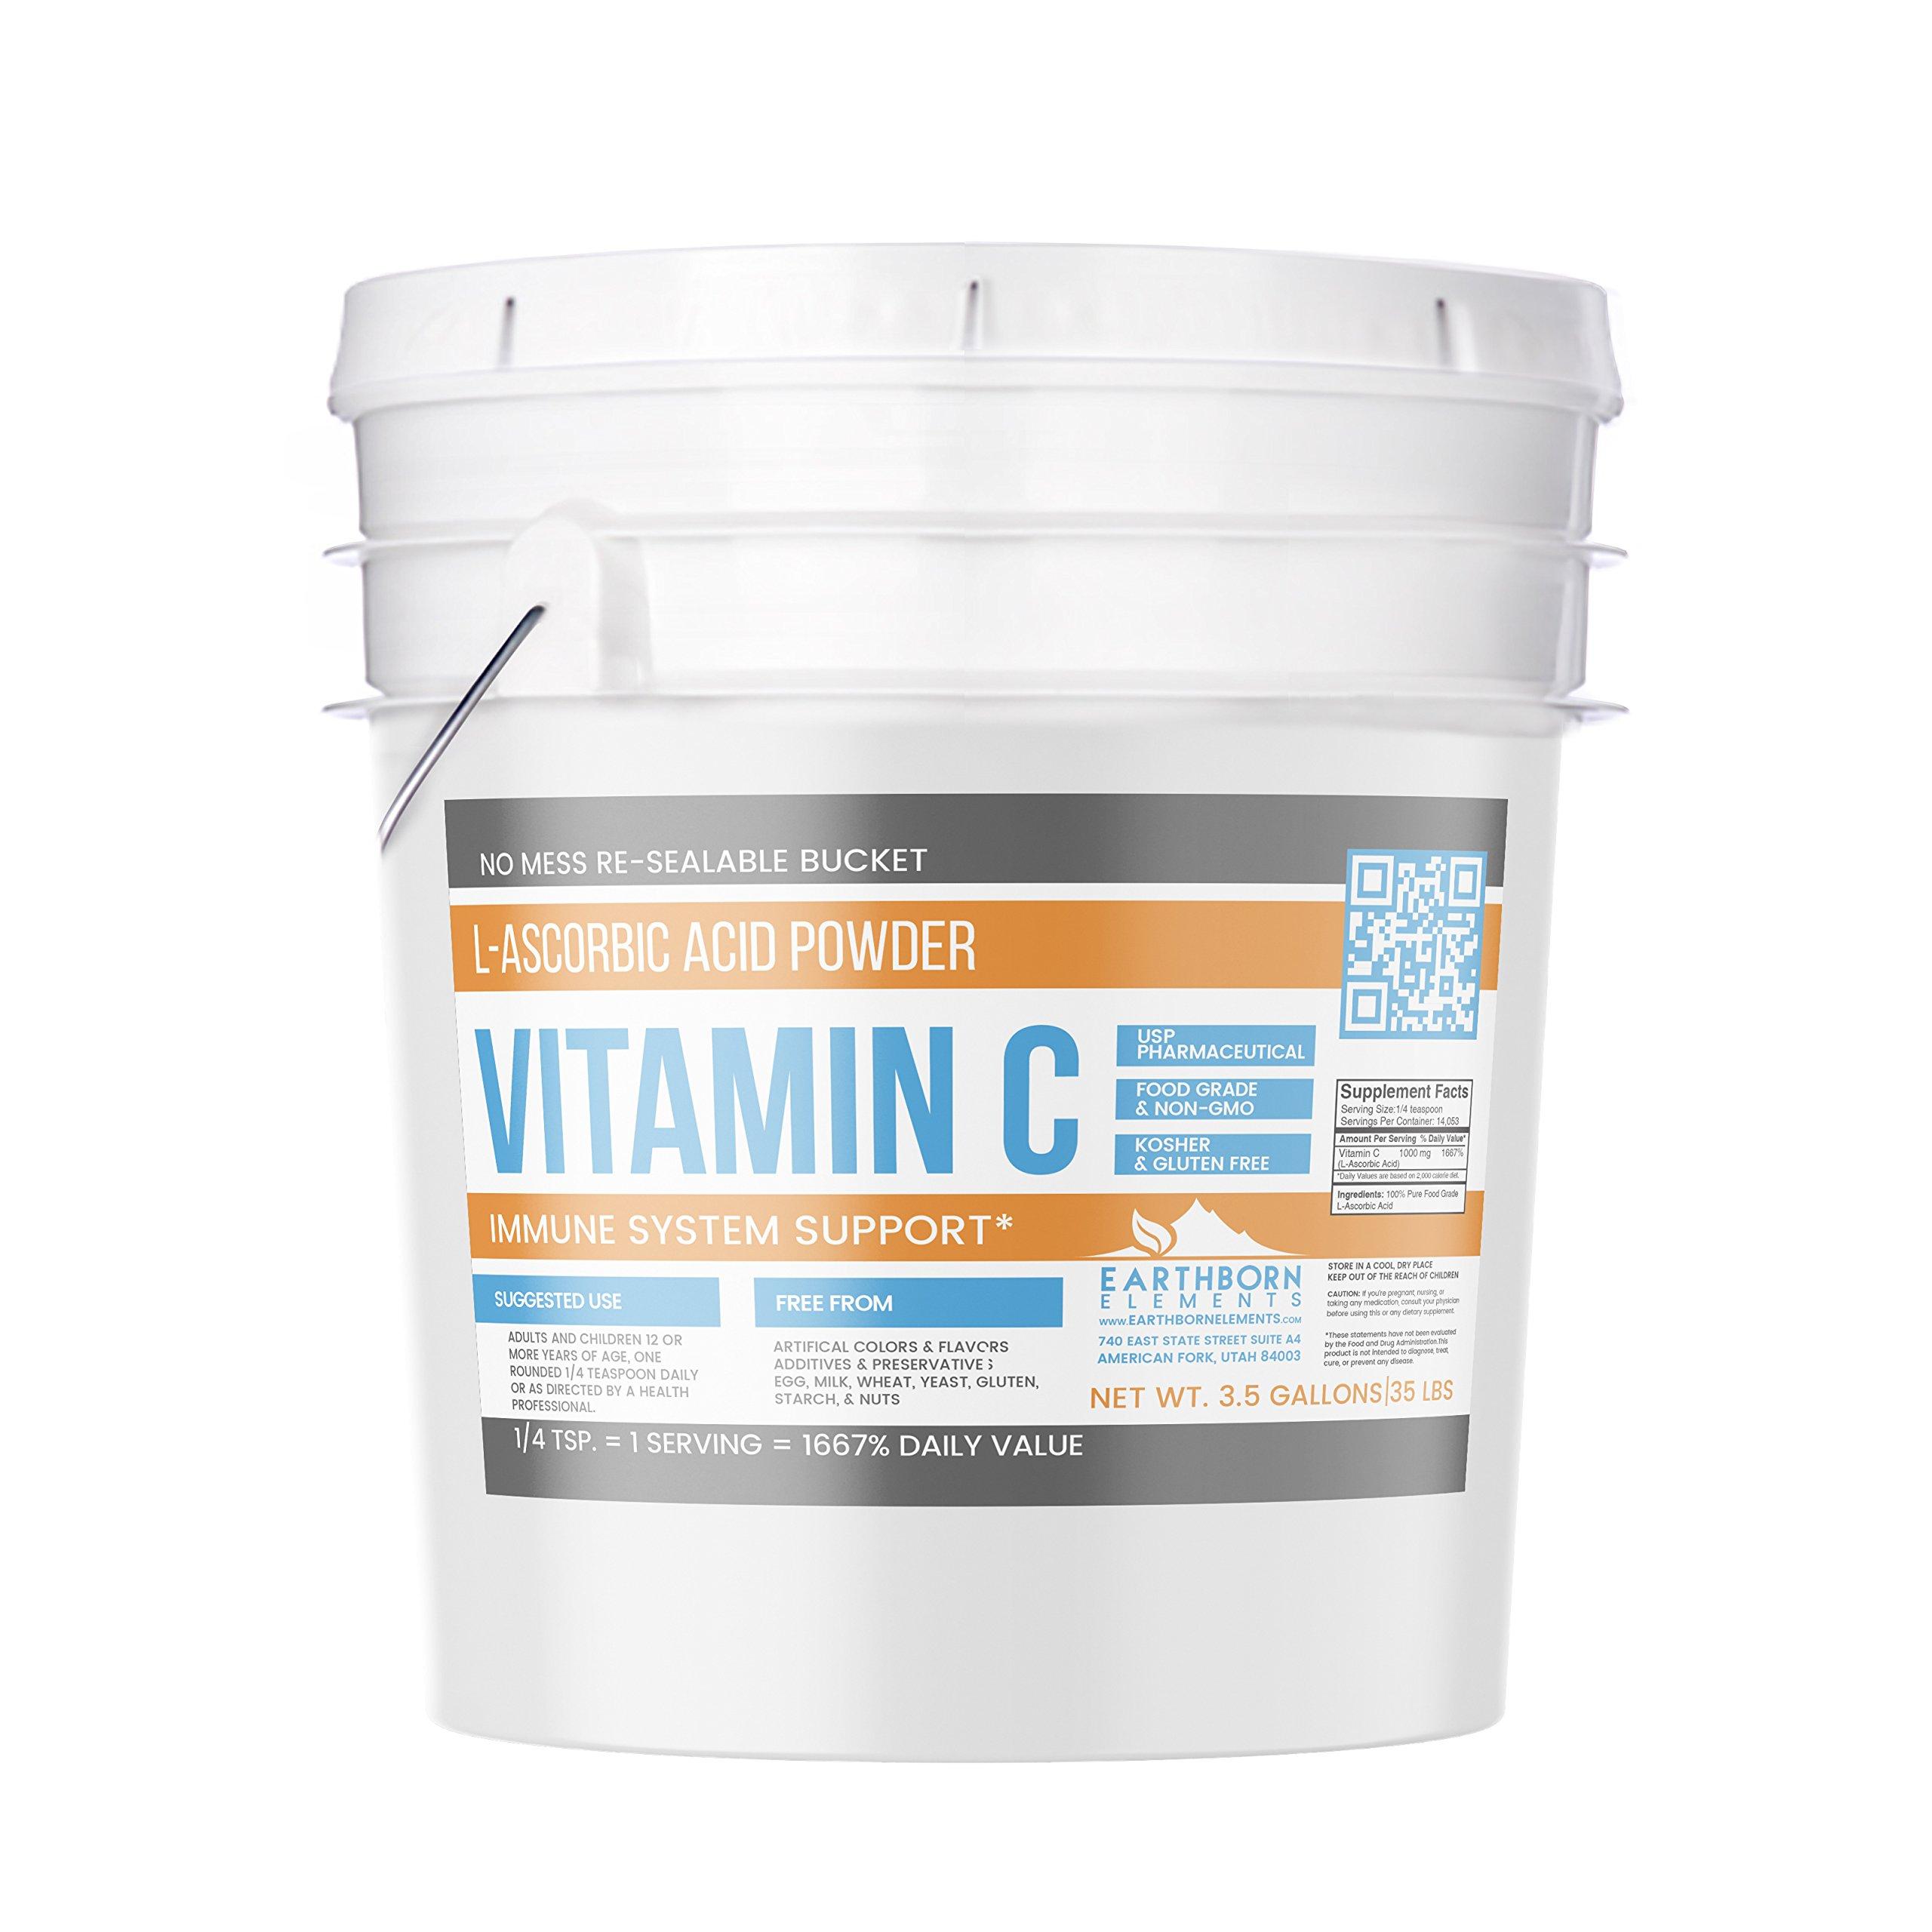 Vitamin C Powder (L-Ascorbic Acid) (3.5 Gallon (35 lb.)) by Earthborn Elements, Resealable Bucket, Antioxidant, Boost Immune System, DIY Skin Care, Satisfaction Guaranteed